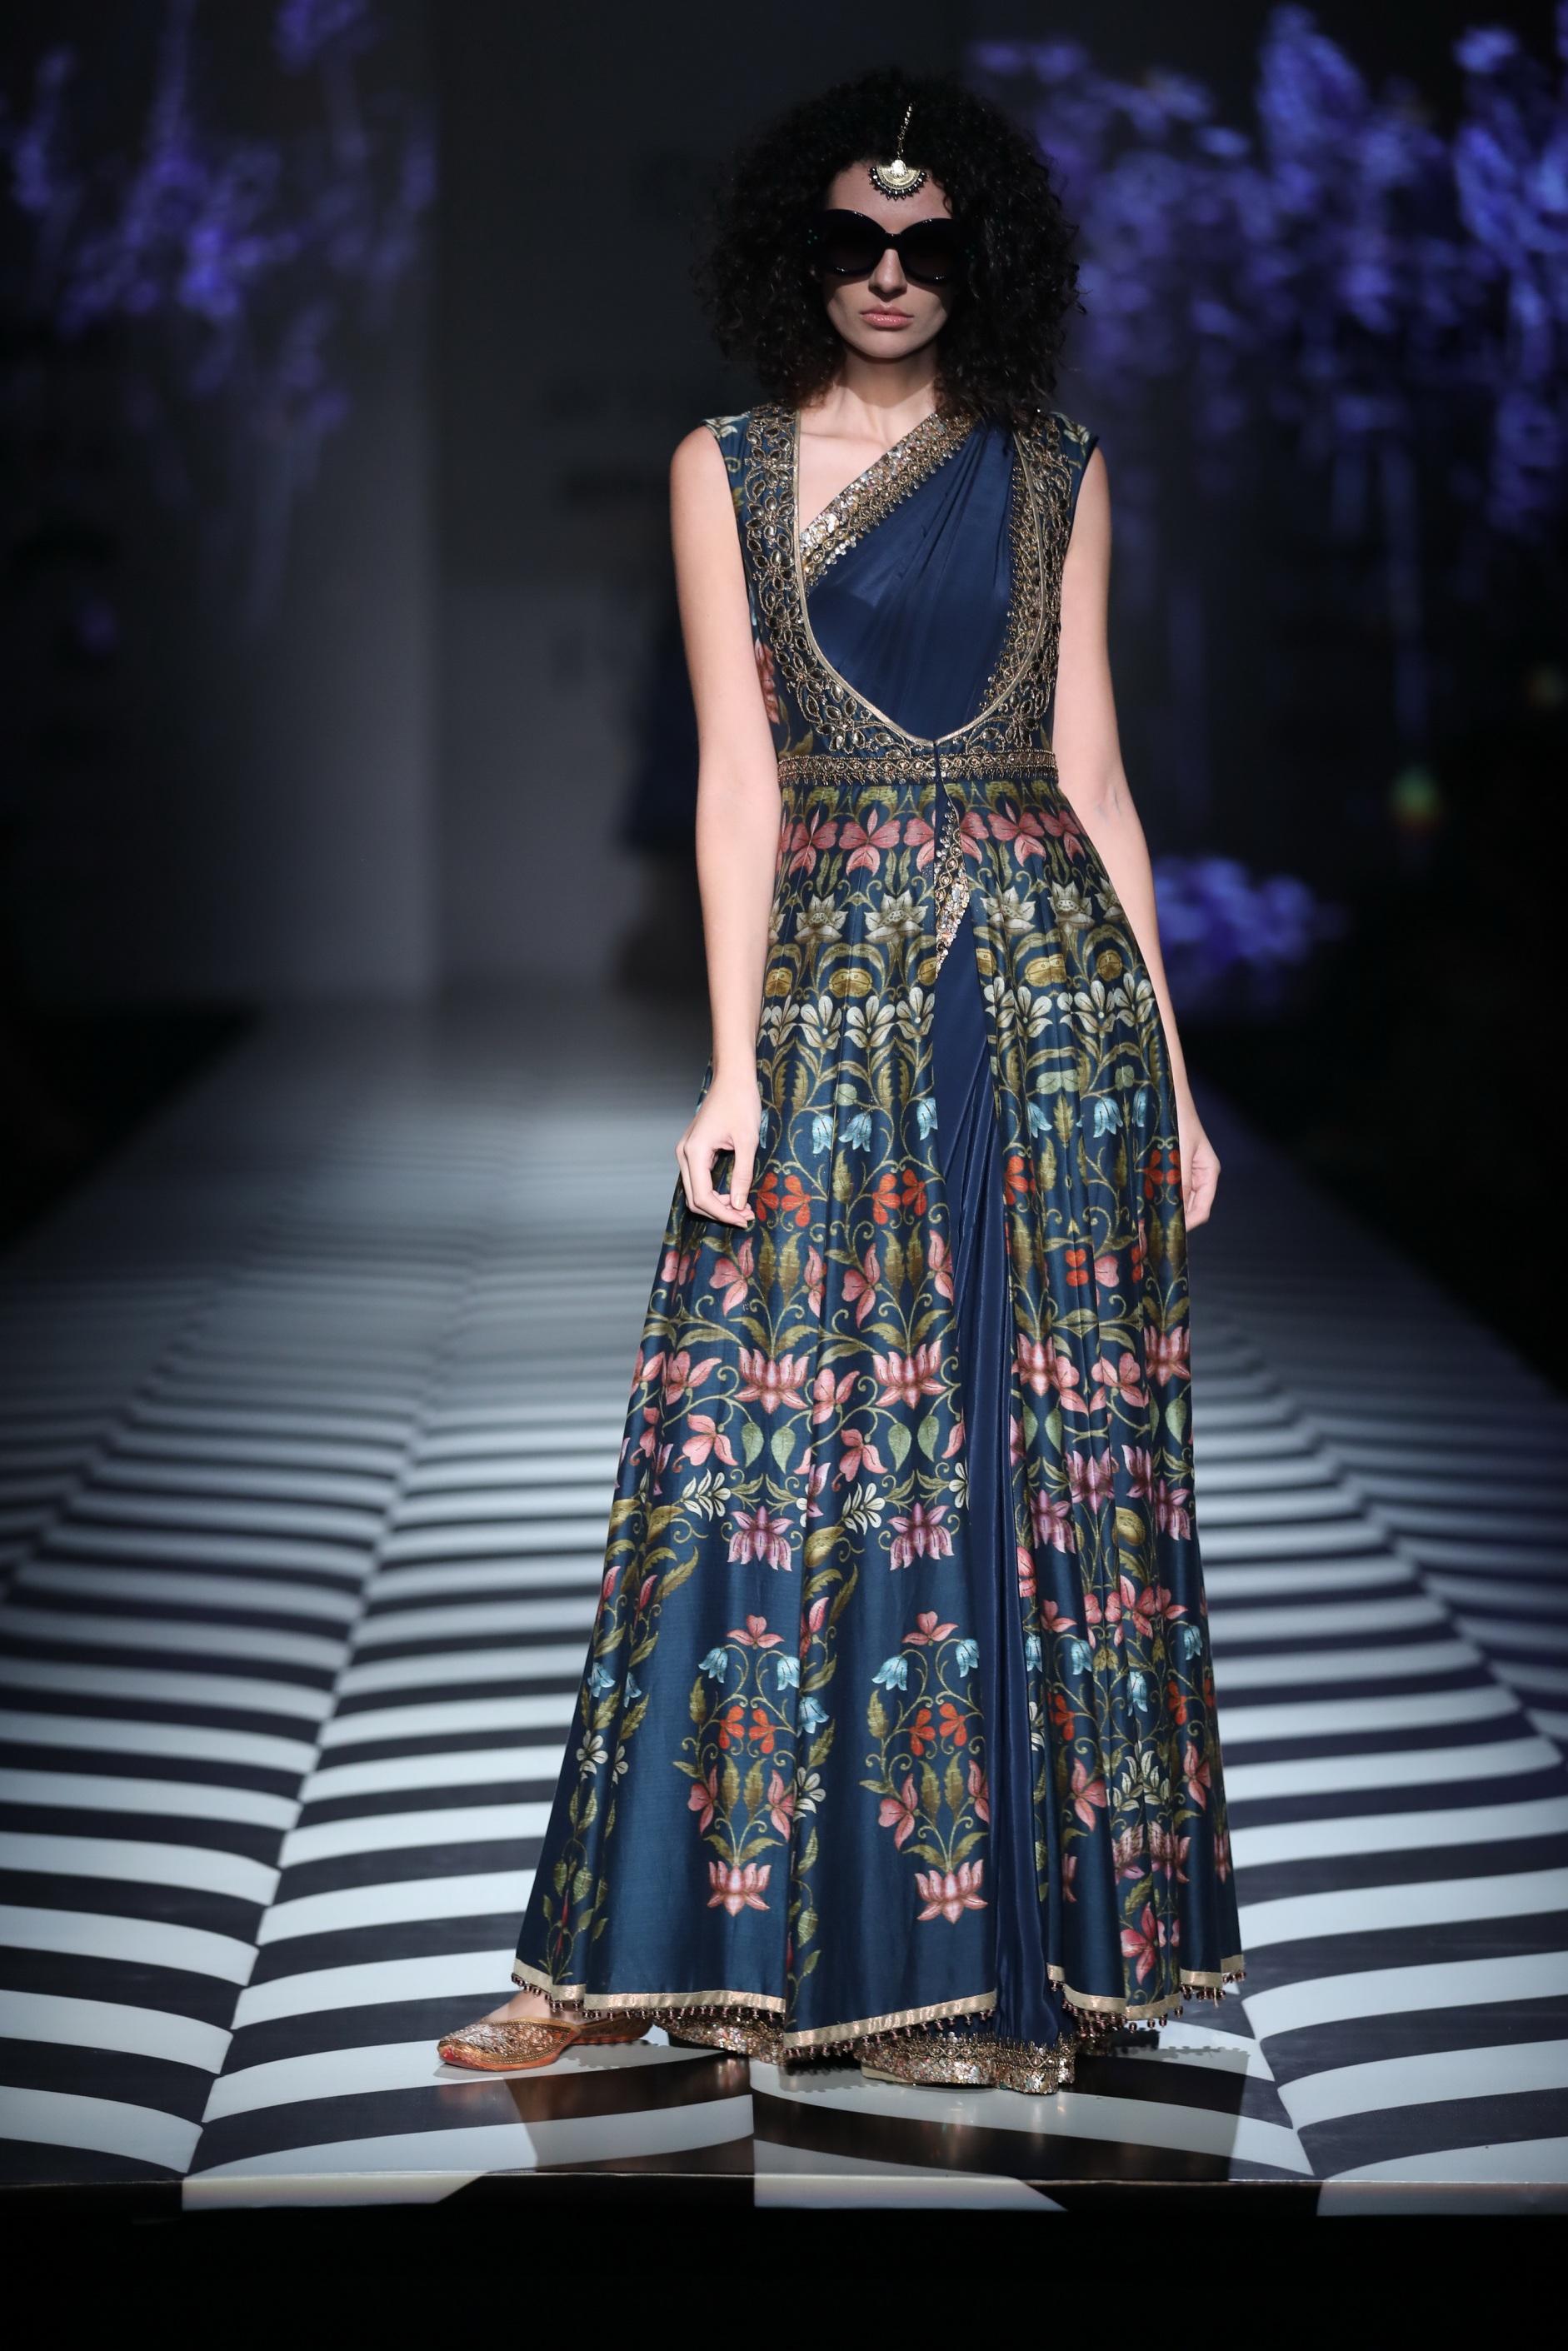 Dubai Fashion Week